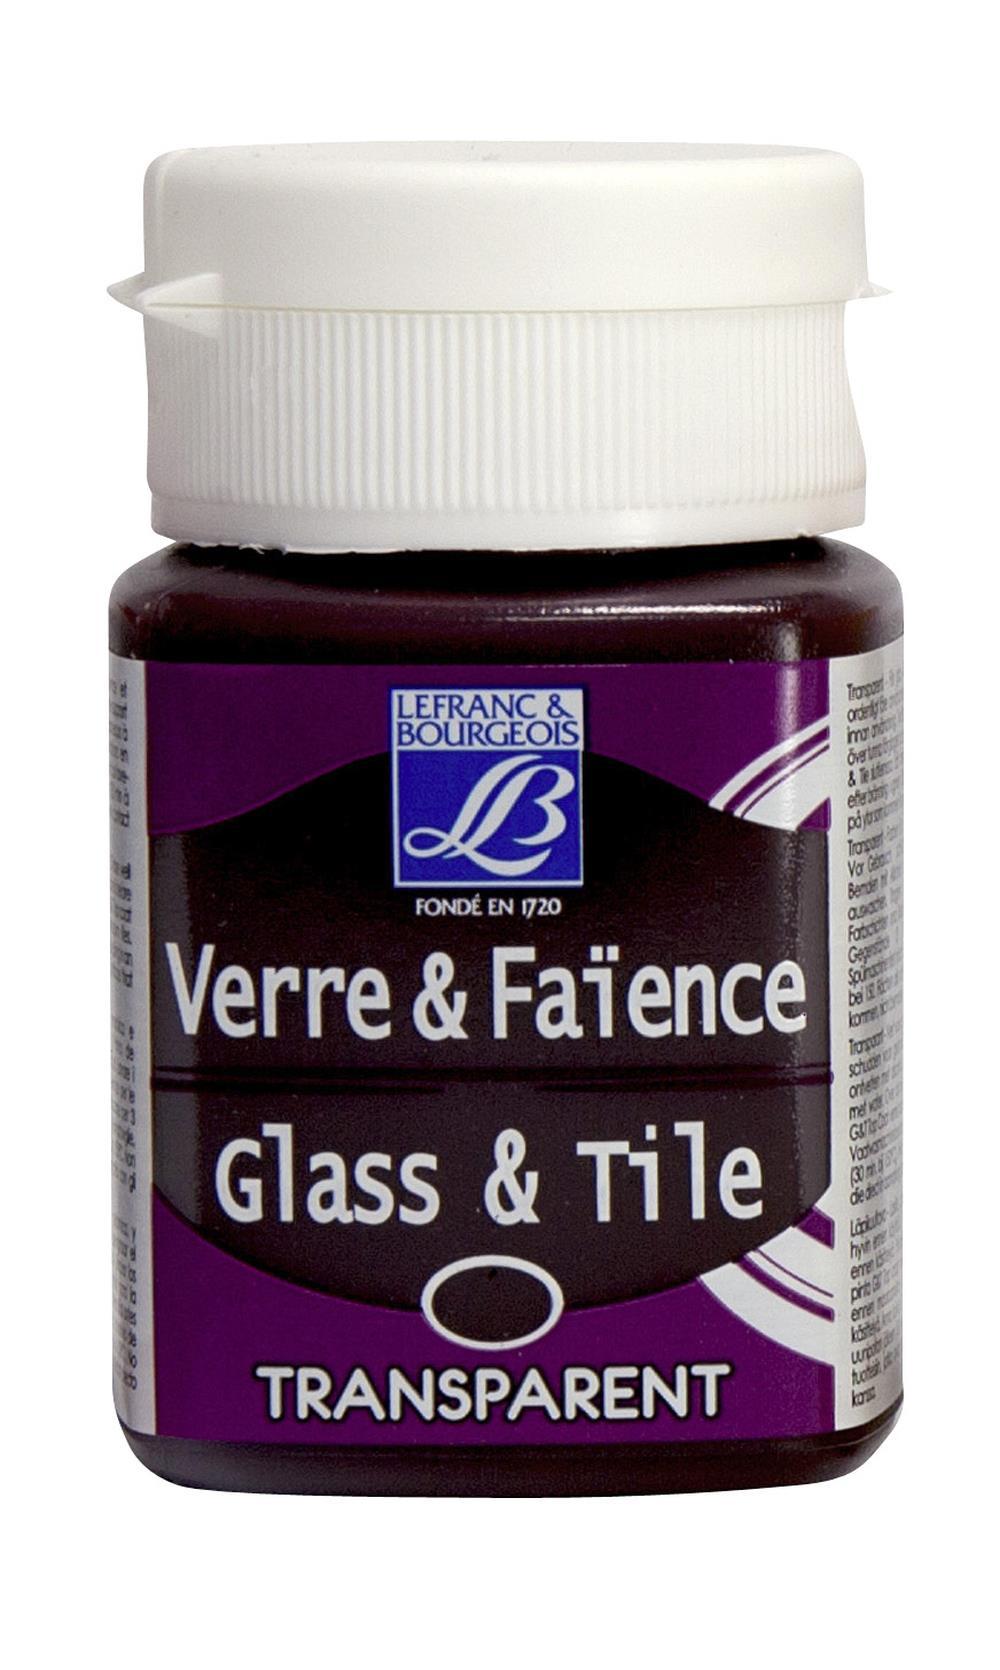 Glas- & keramikfärg L&B 50ml  Kinaröd, transparent  368 (4F) Utgår